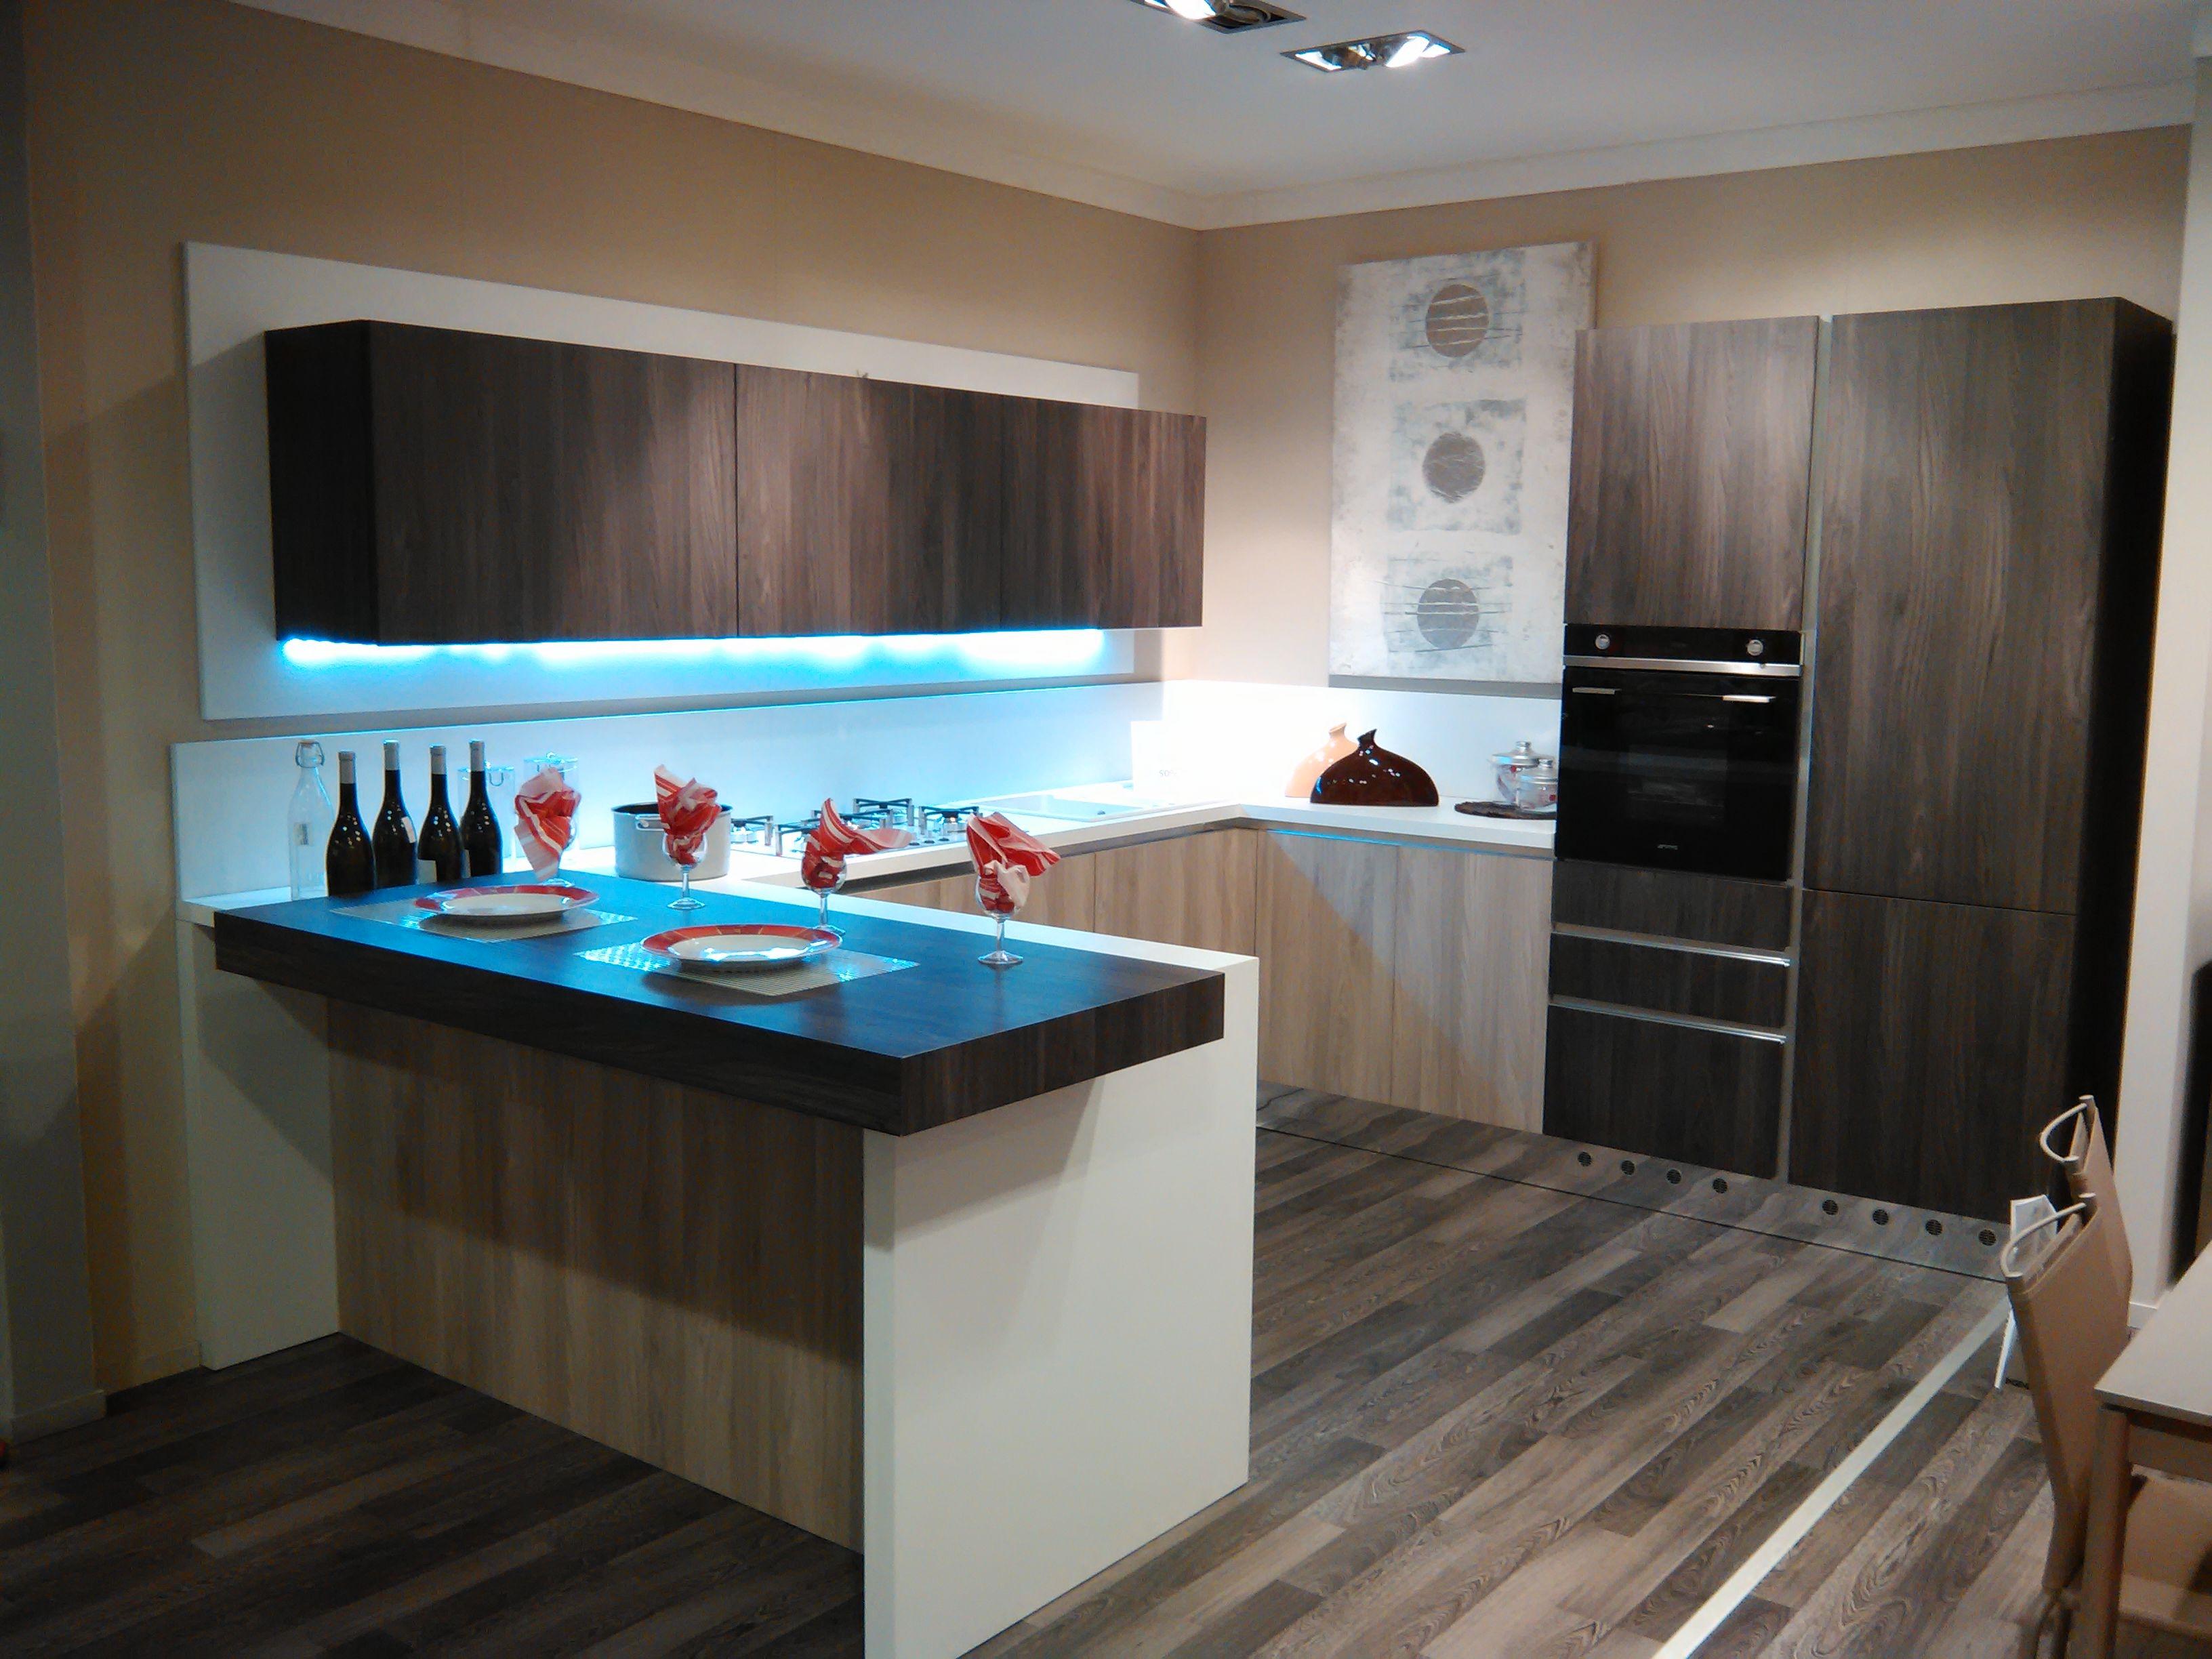 Astra cucine cucina m22 saldo scontato del 54 cucine for Arredamento in saldo